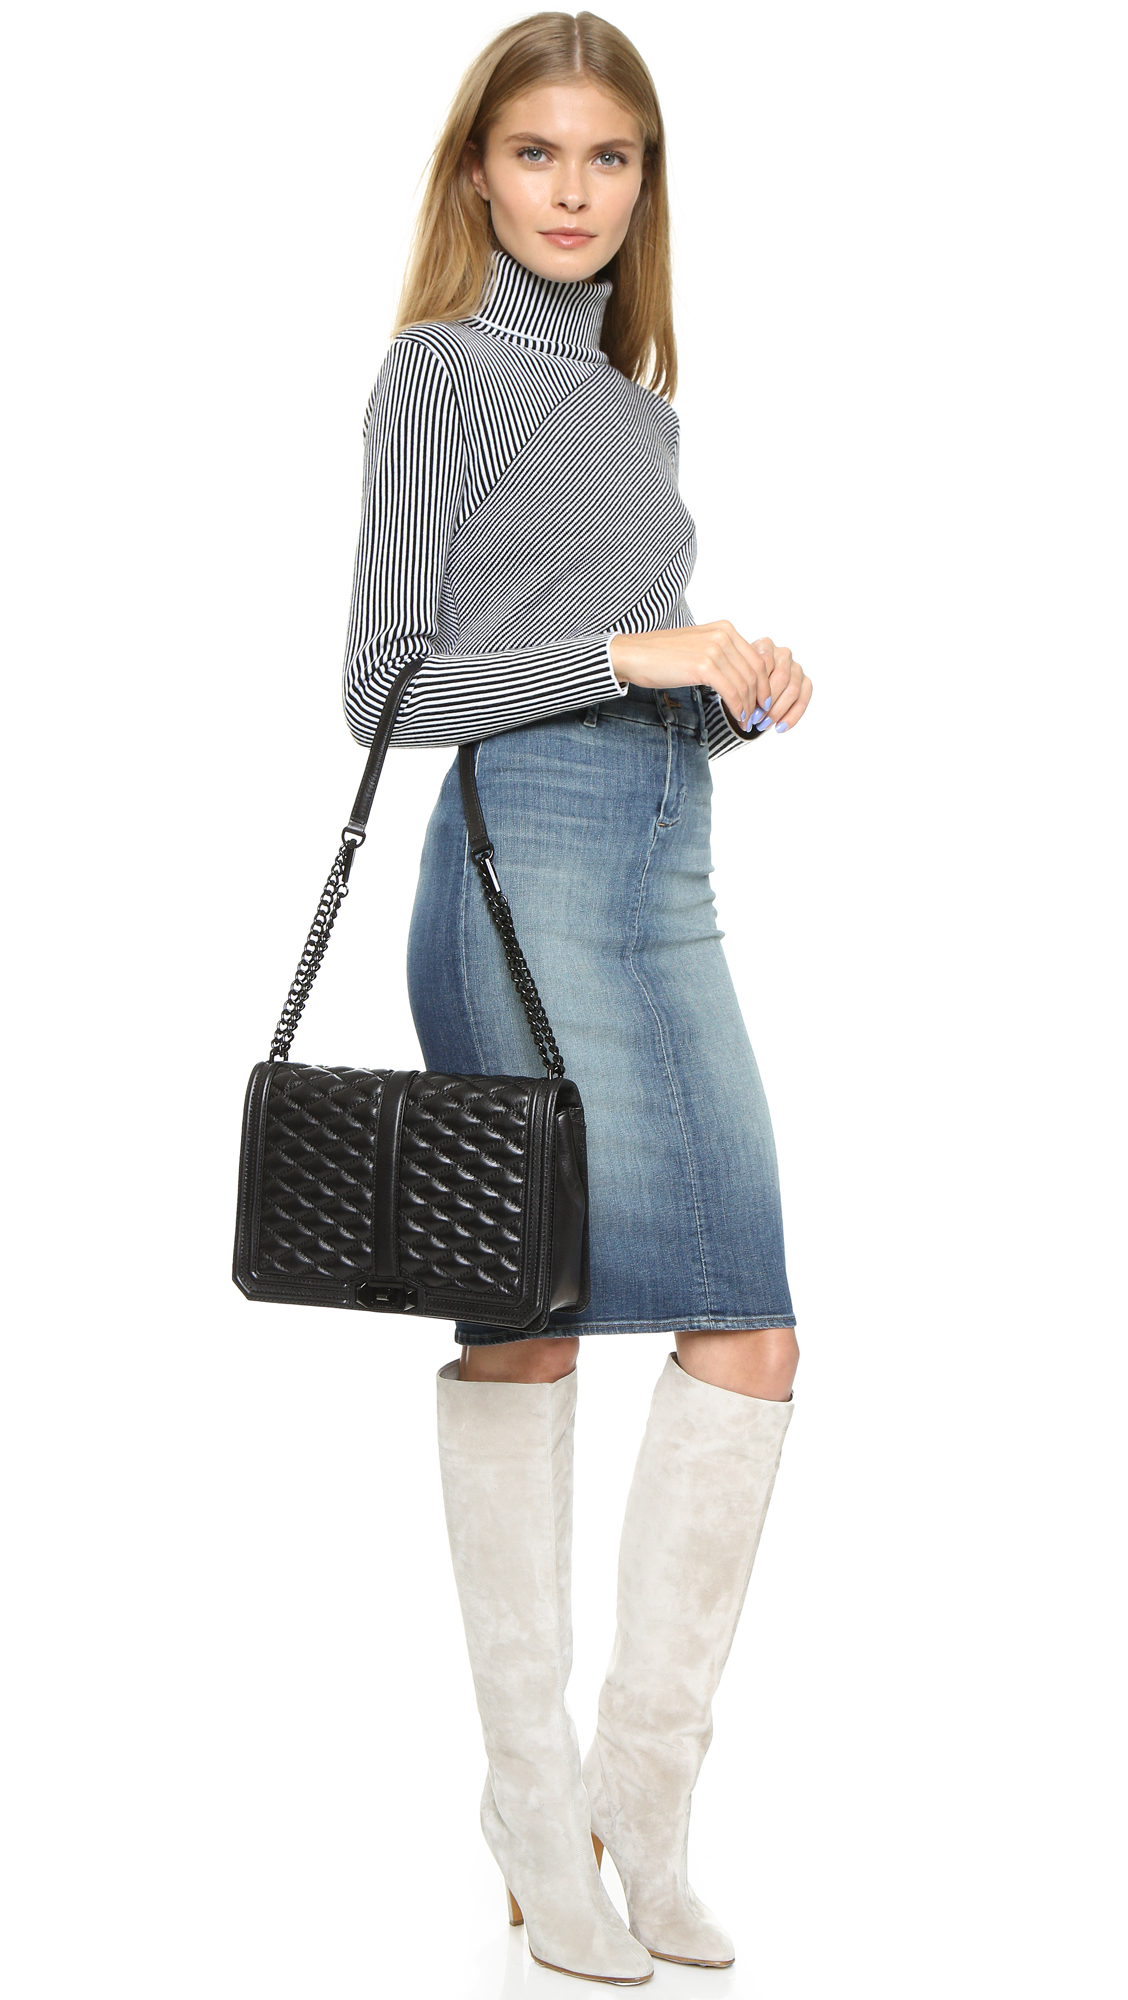 Rebecca Minkoff Rebecca Minkoff Love Jumbo Shoulder Bag